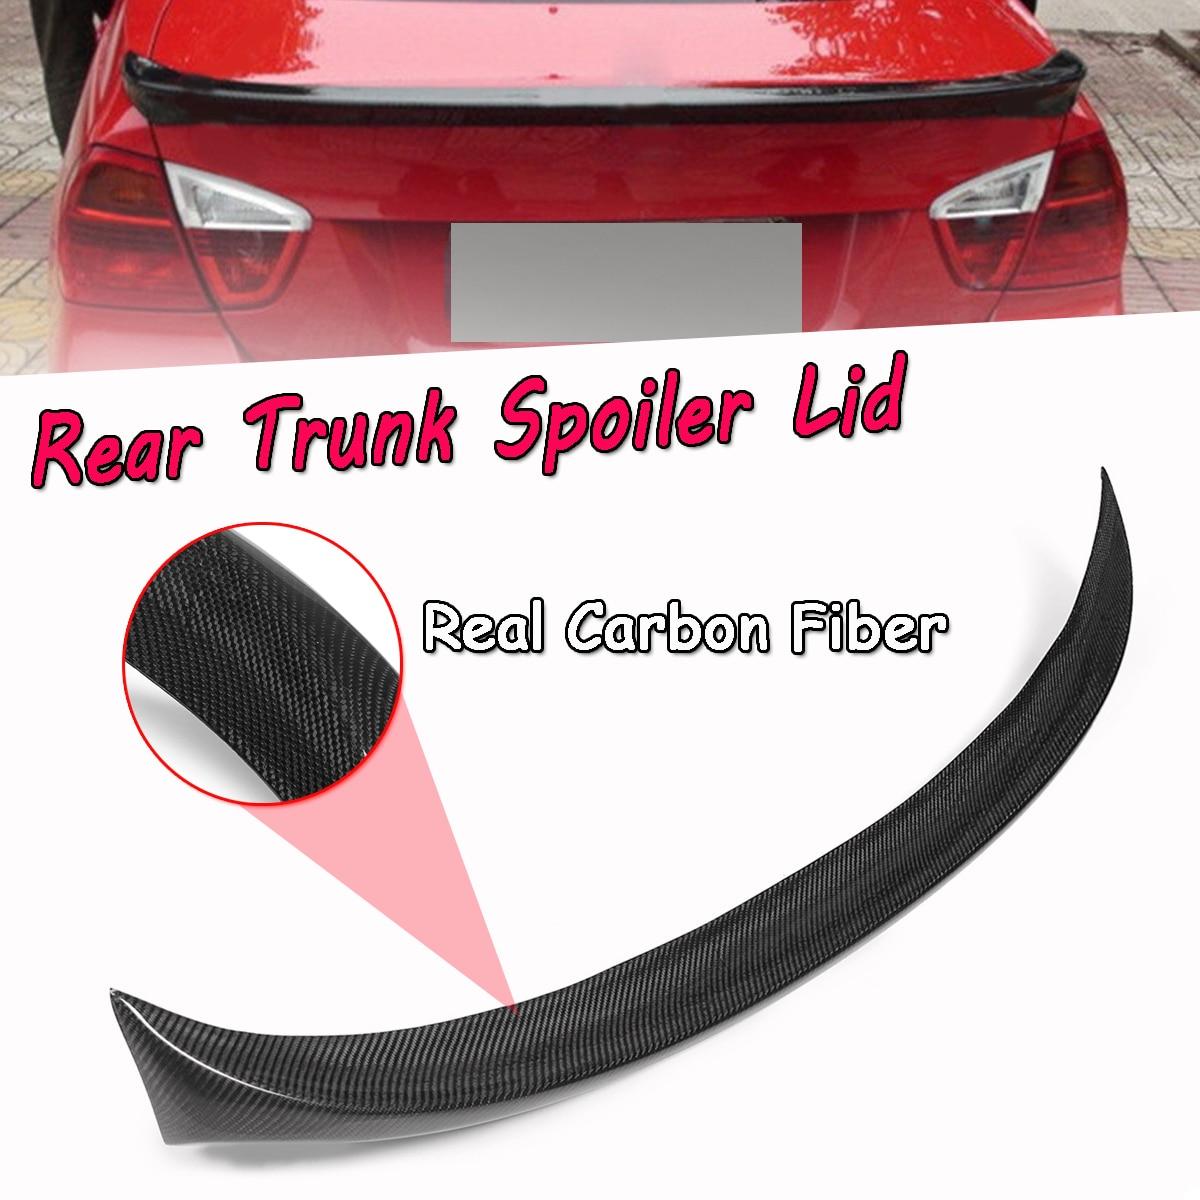 For BMW E90 3 Series 4dr Sedan 2006-2011 Real Carbon Fiber Rear Trunk Spoiler Lid Rear Wing Spoiler Rear Trunk Roof Wing 120cm for 12 16 bmw 3 series f30 4dr trunk spoiler oem painted match a83 glacier silver